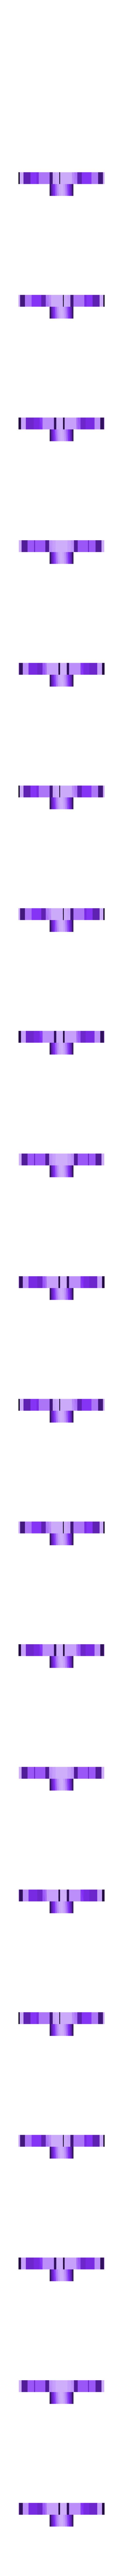 pcb_holder_5.STL Download free STL file PCB HOLDER Evo • 3D printer model, TheTNR